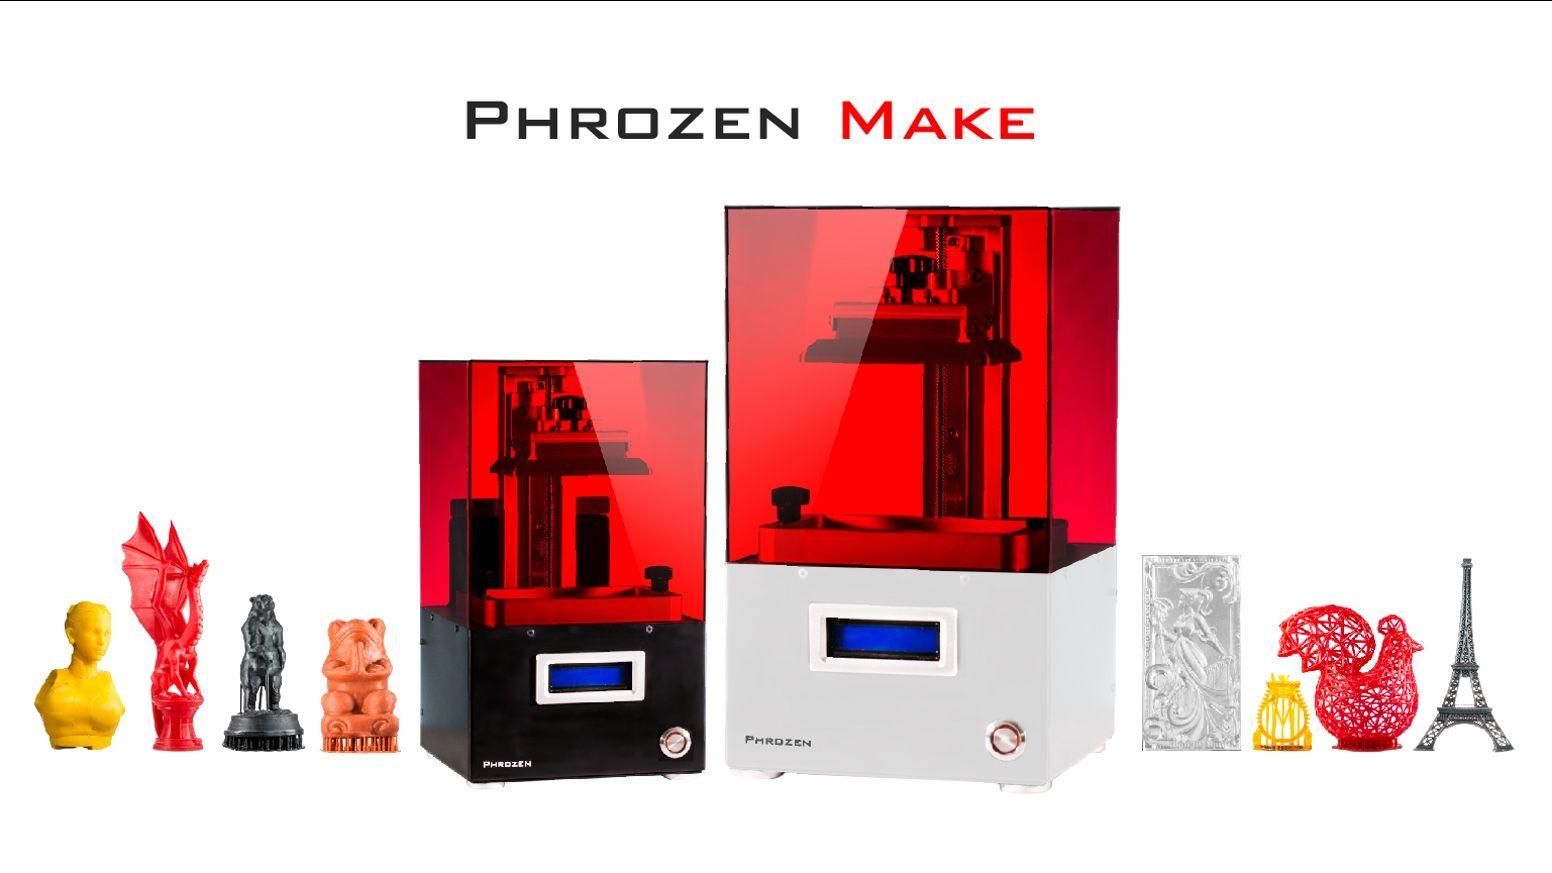 Phrozen make resin 3d printer boasts 2k resolution with lcd lighting phrozen make resin 3d printer boasts 2k resolution with lcd lighting via solidsmack arubaitofo Choice Image